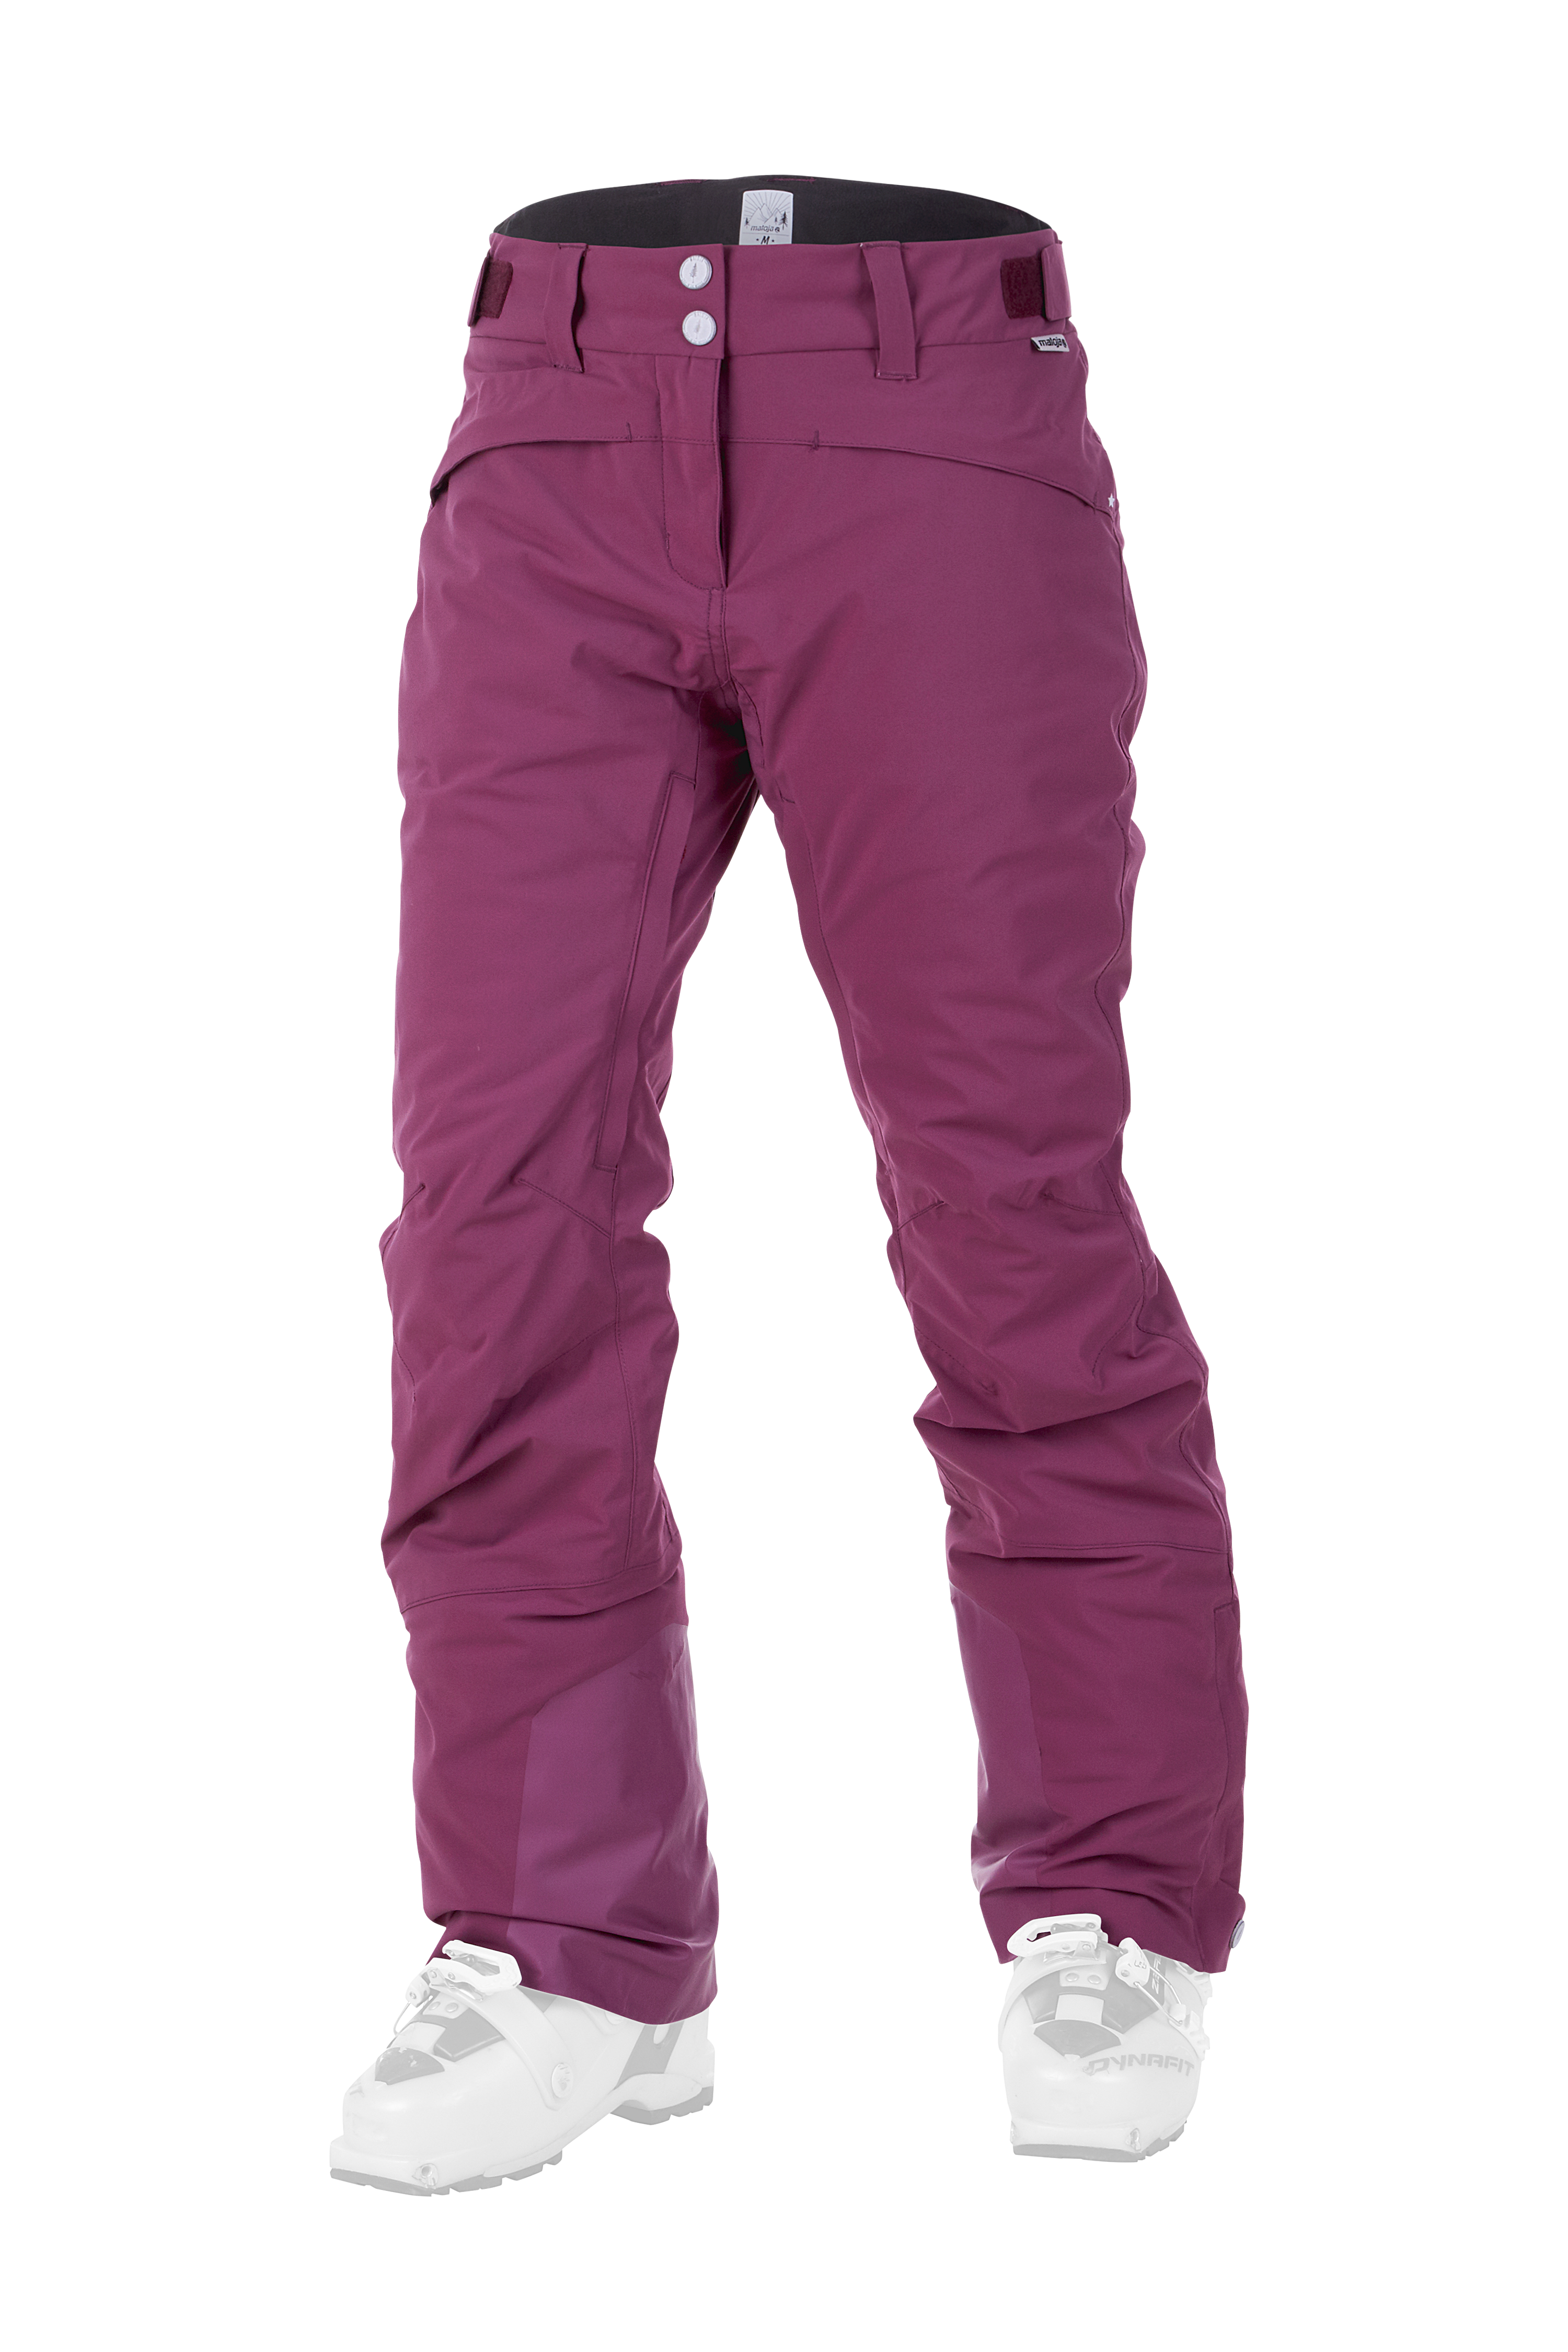 padded ski pants